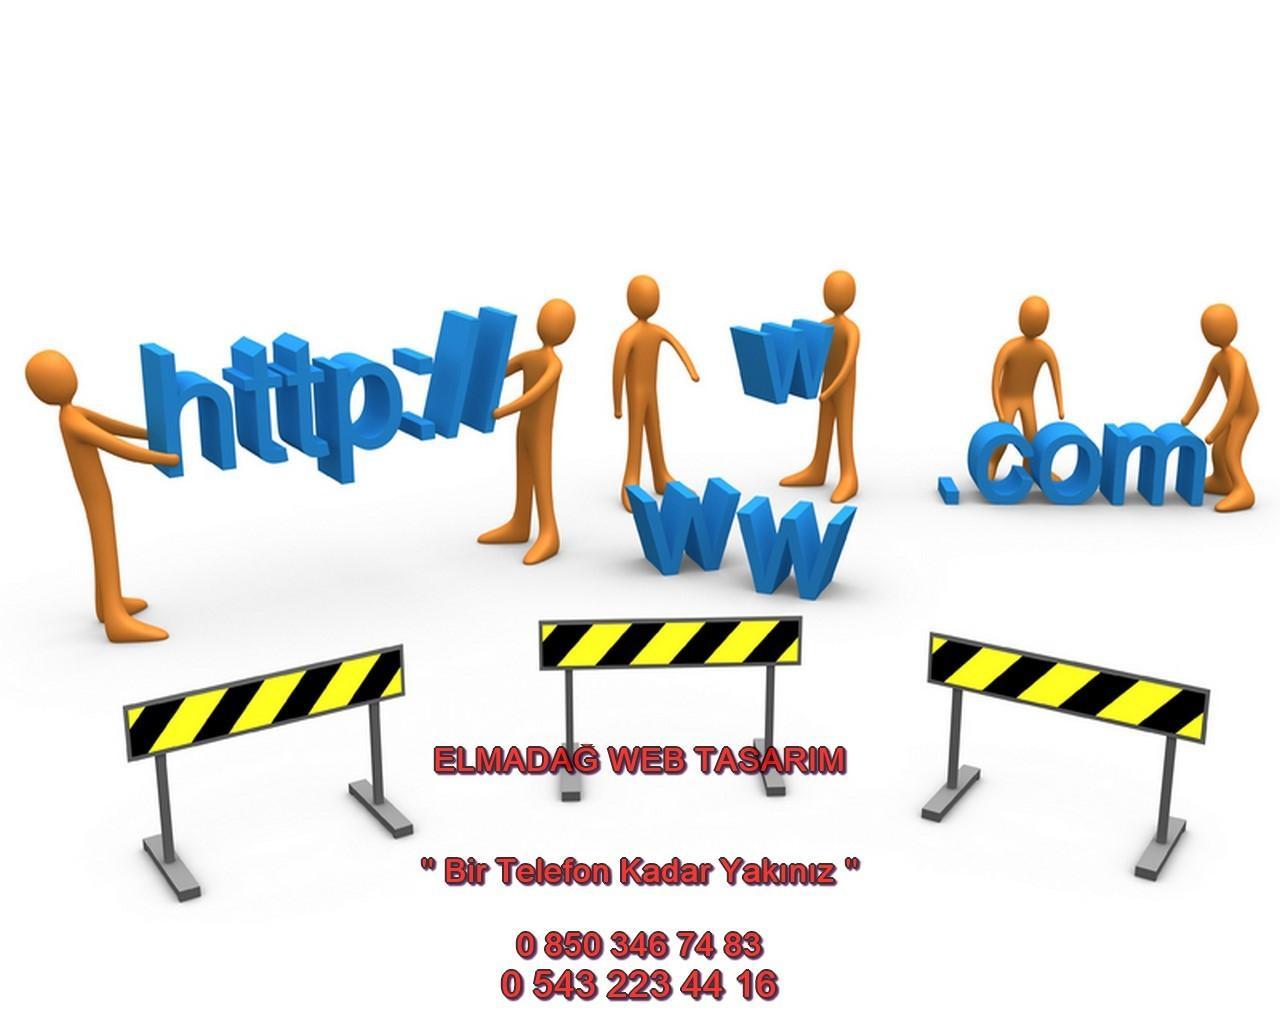 Elmadağ Web Tasarım